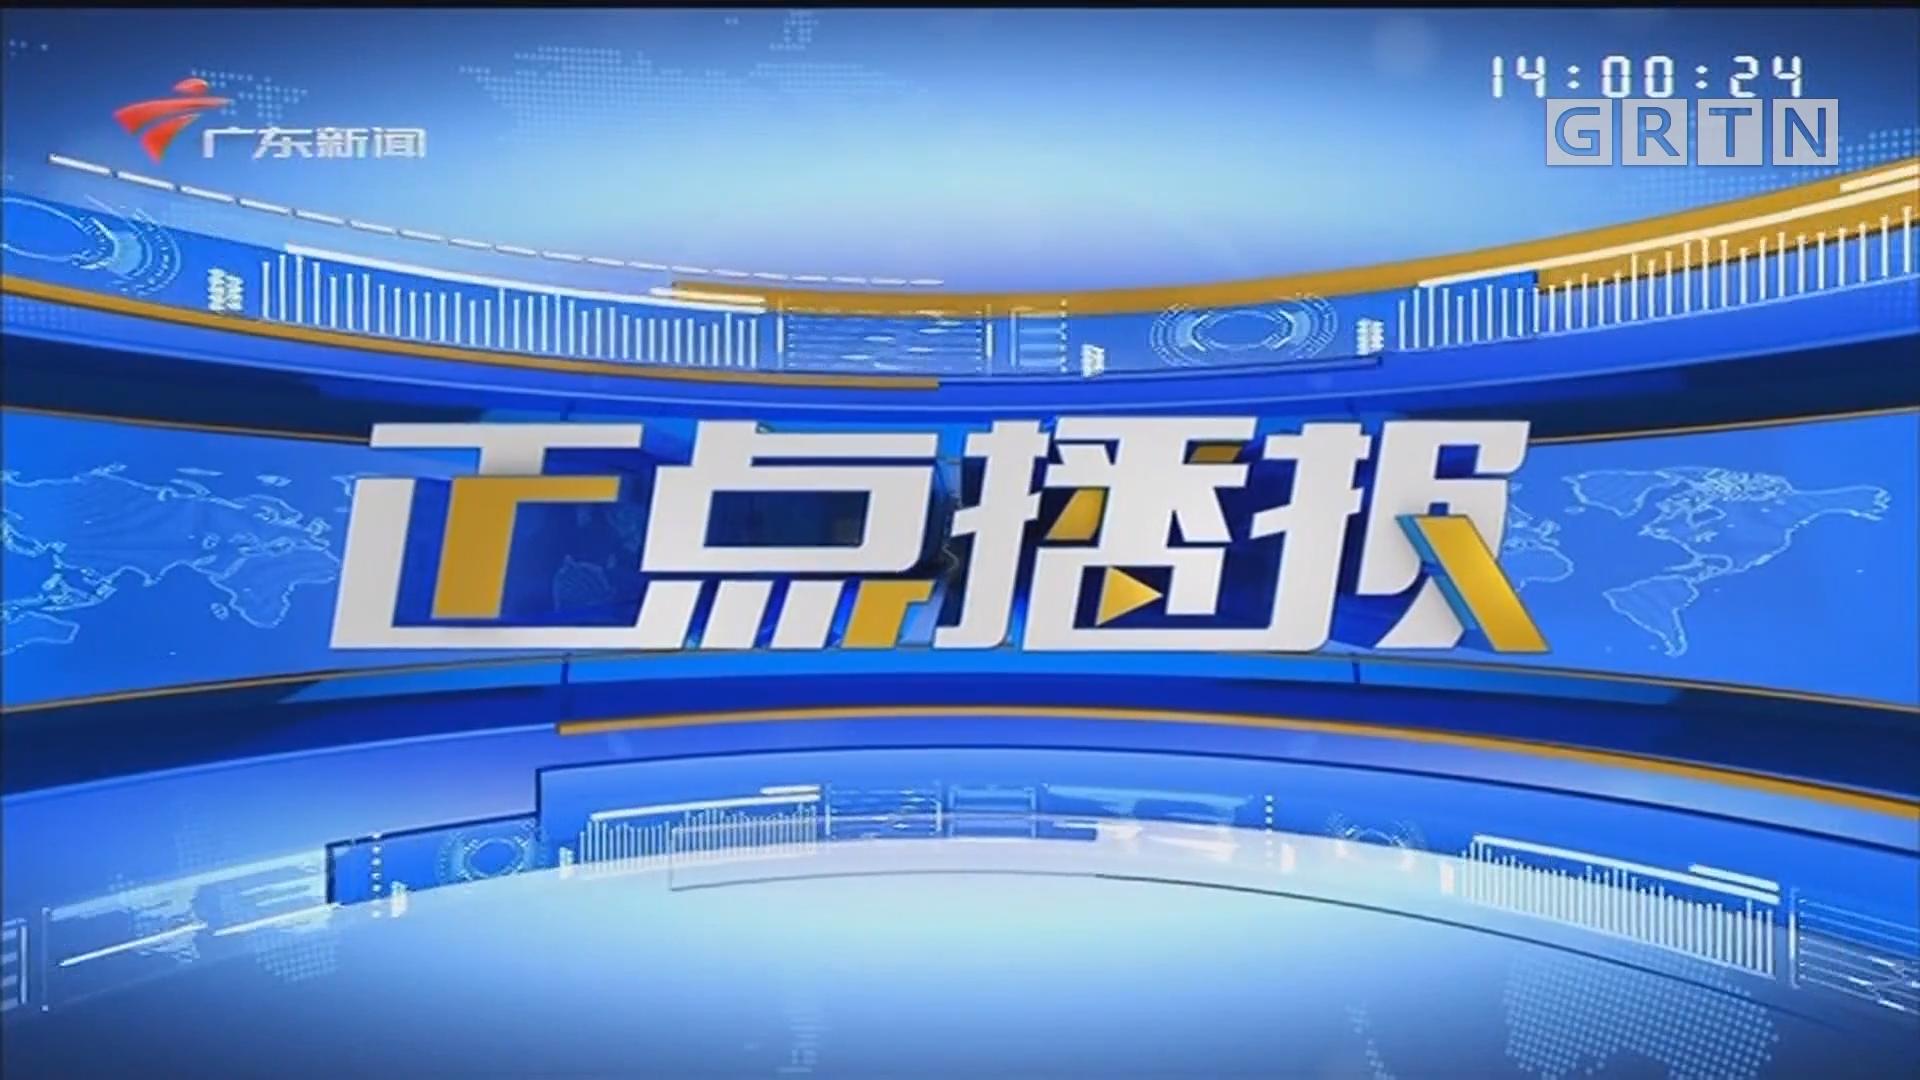 [HD][2020-01-11-14:00]正点播报:伊媒:伊军方承认意外击落乌克兰客机20200111/广东新闻/正点播报